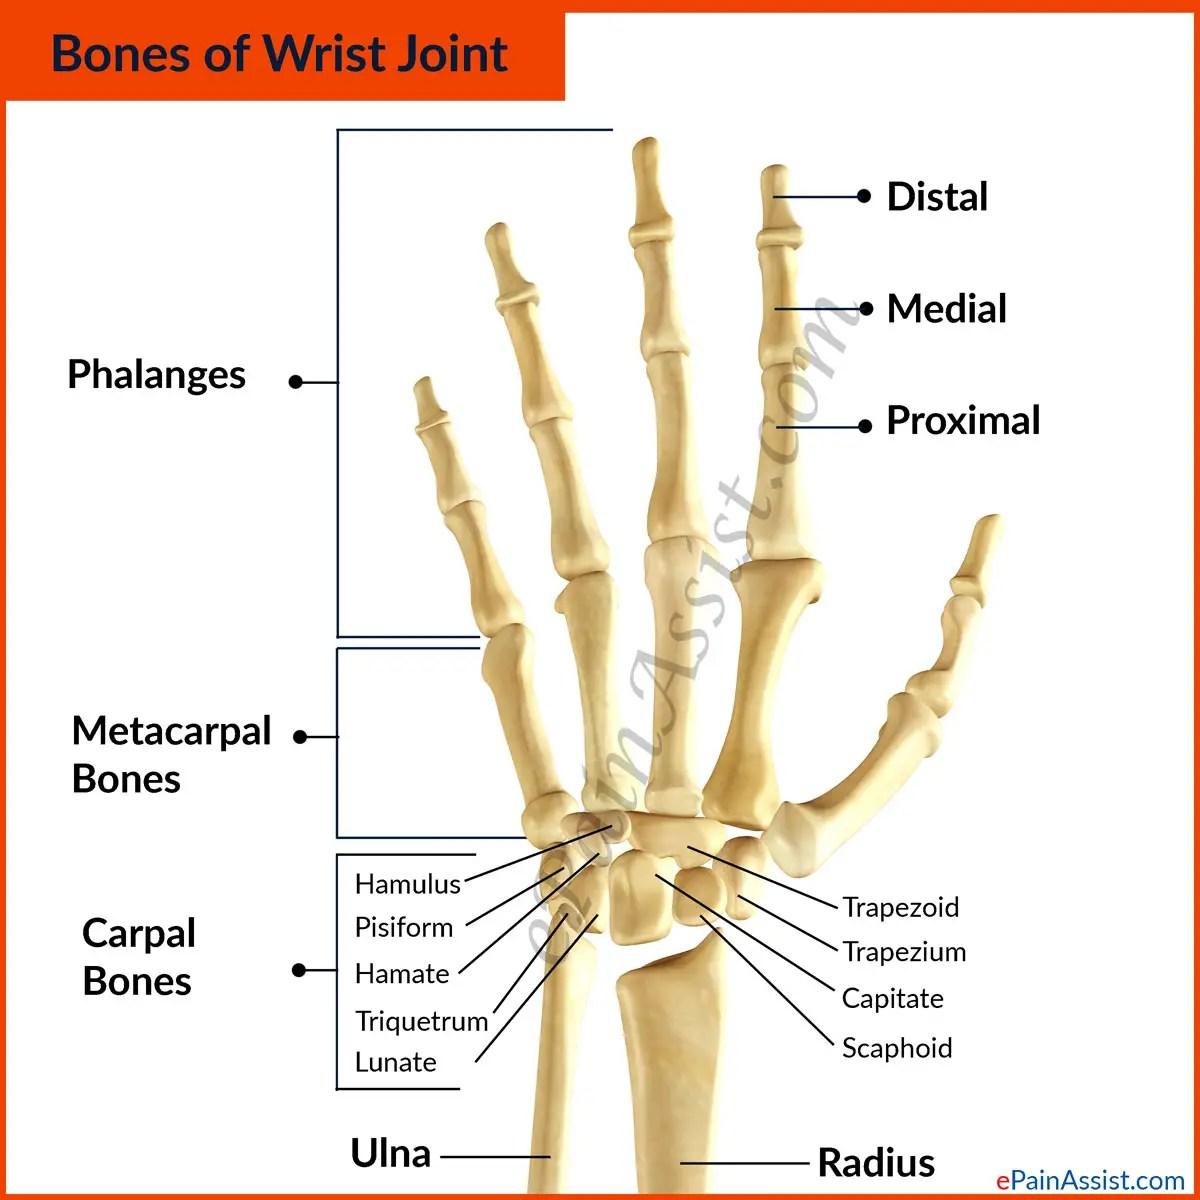 Wrist Joint Anatomy Bones Movements Ligaments Tendons